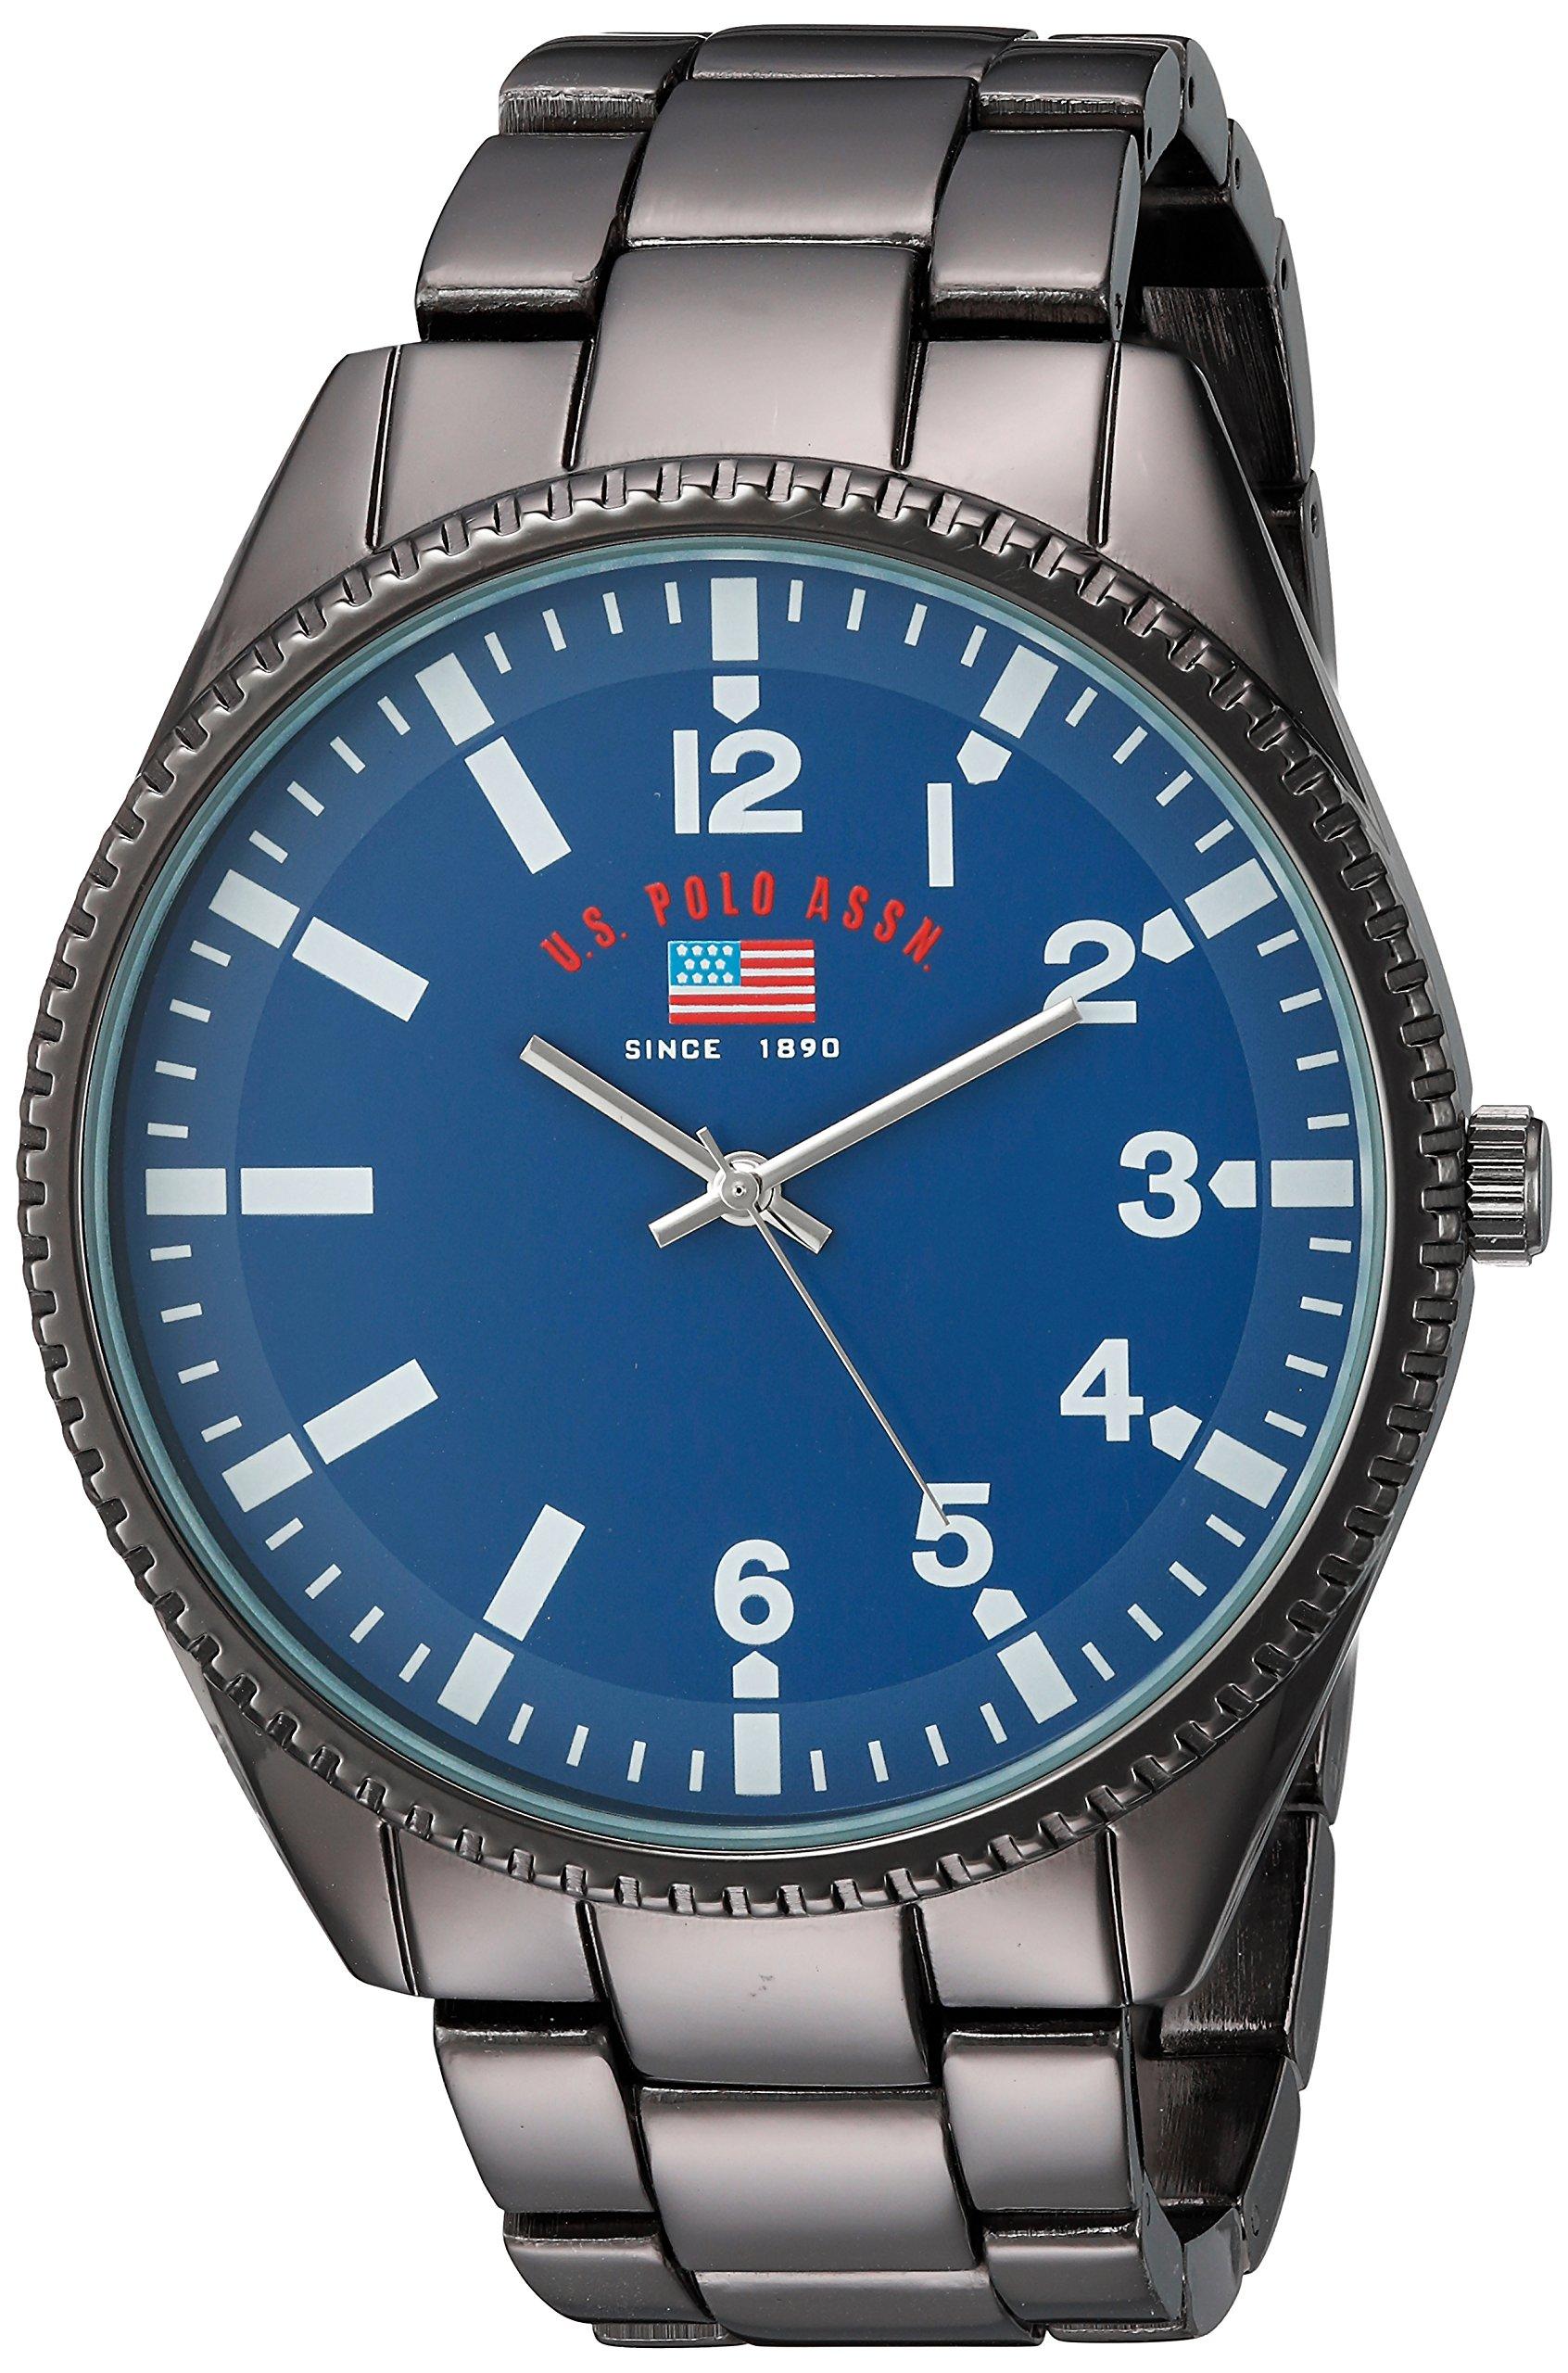 Men's Analog-Quartz Watch with Alloy Strap, Black, 10 (Model: US8641)